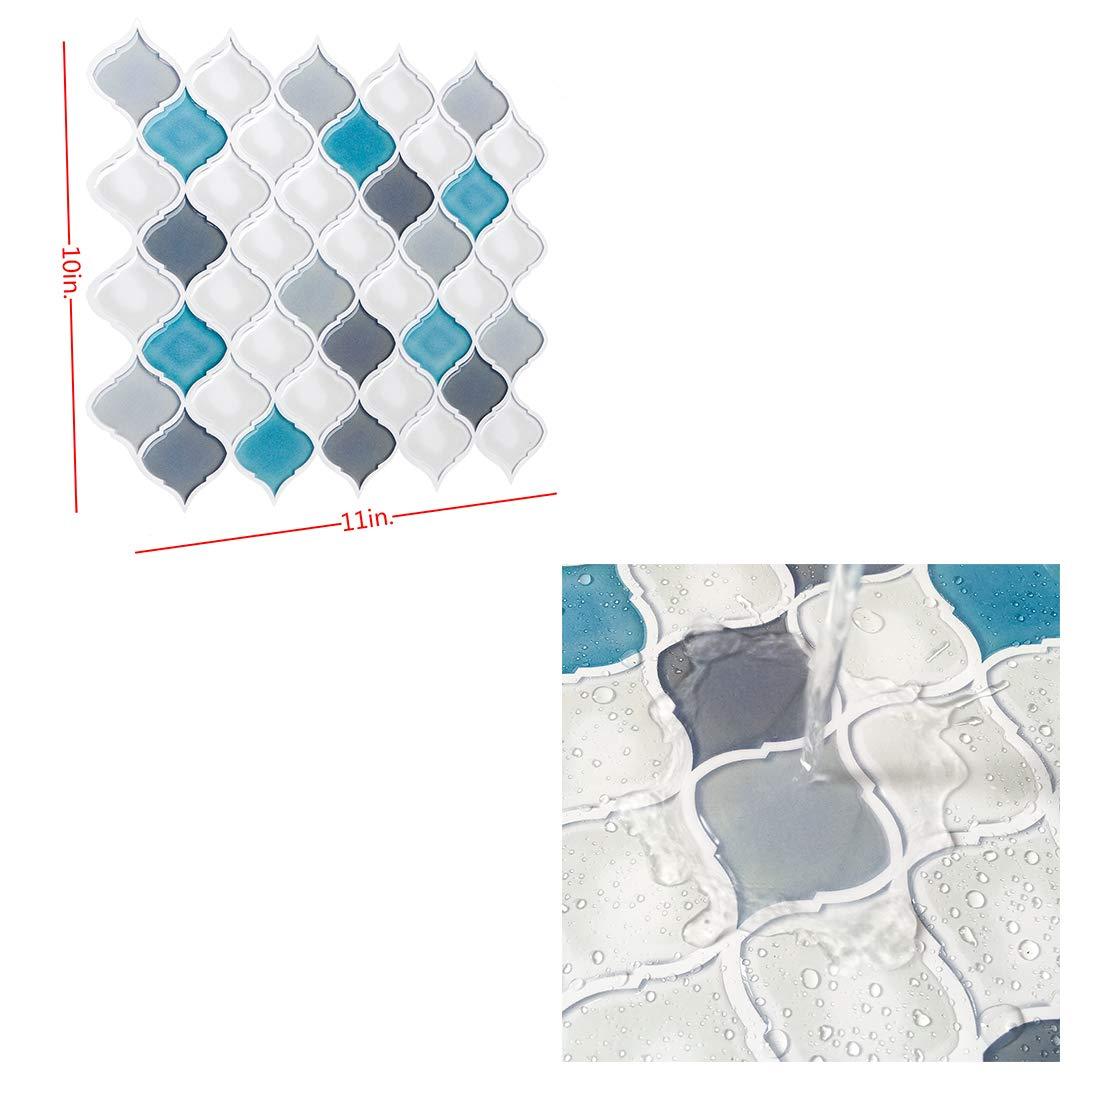 Peel and Stick Wall Tile for Kitchen Backsplash-Slant Blue&White Arabesque Tile Backsplash-Kitchen Backsplash Tiles Peel and Stick Wall Stickers,6 Sheets by FAM STICKTILES (Image #2)